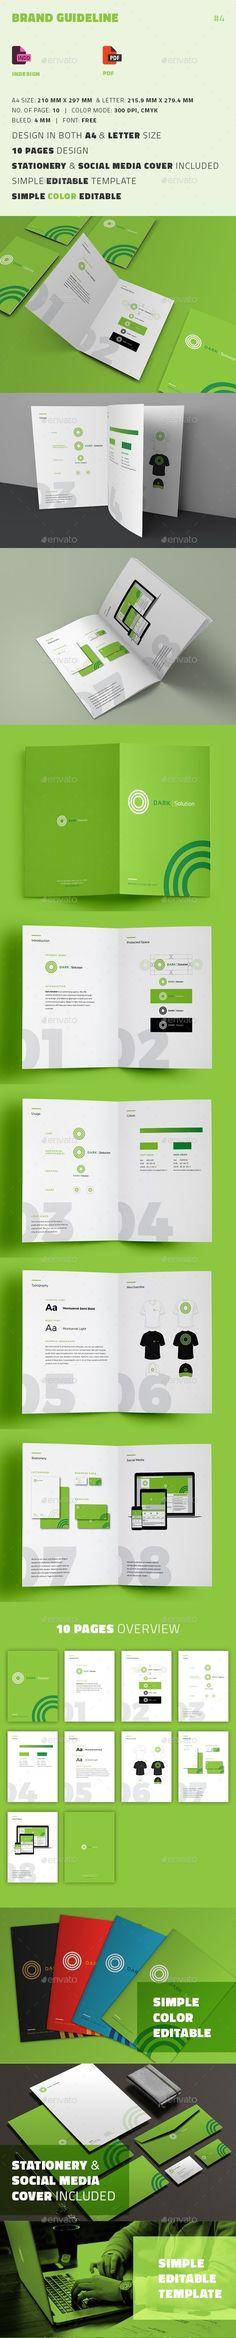 Brand Guideline Brochure Template PSD, Vector EPS, InDesign INDD, AI Illustrator